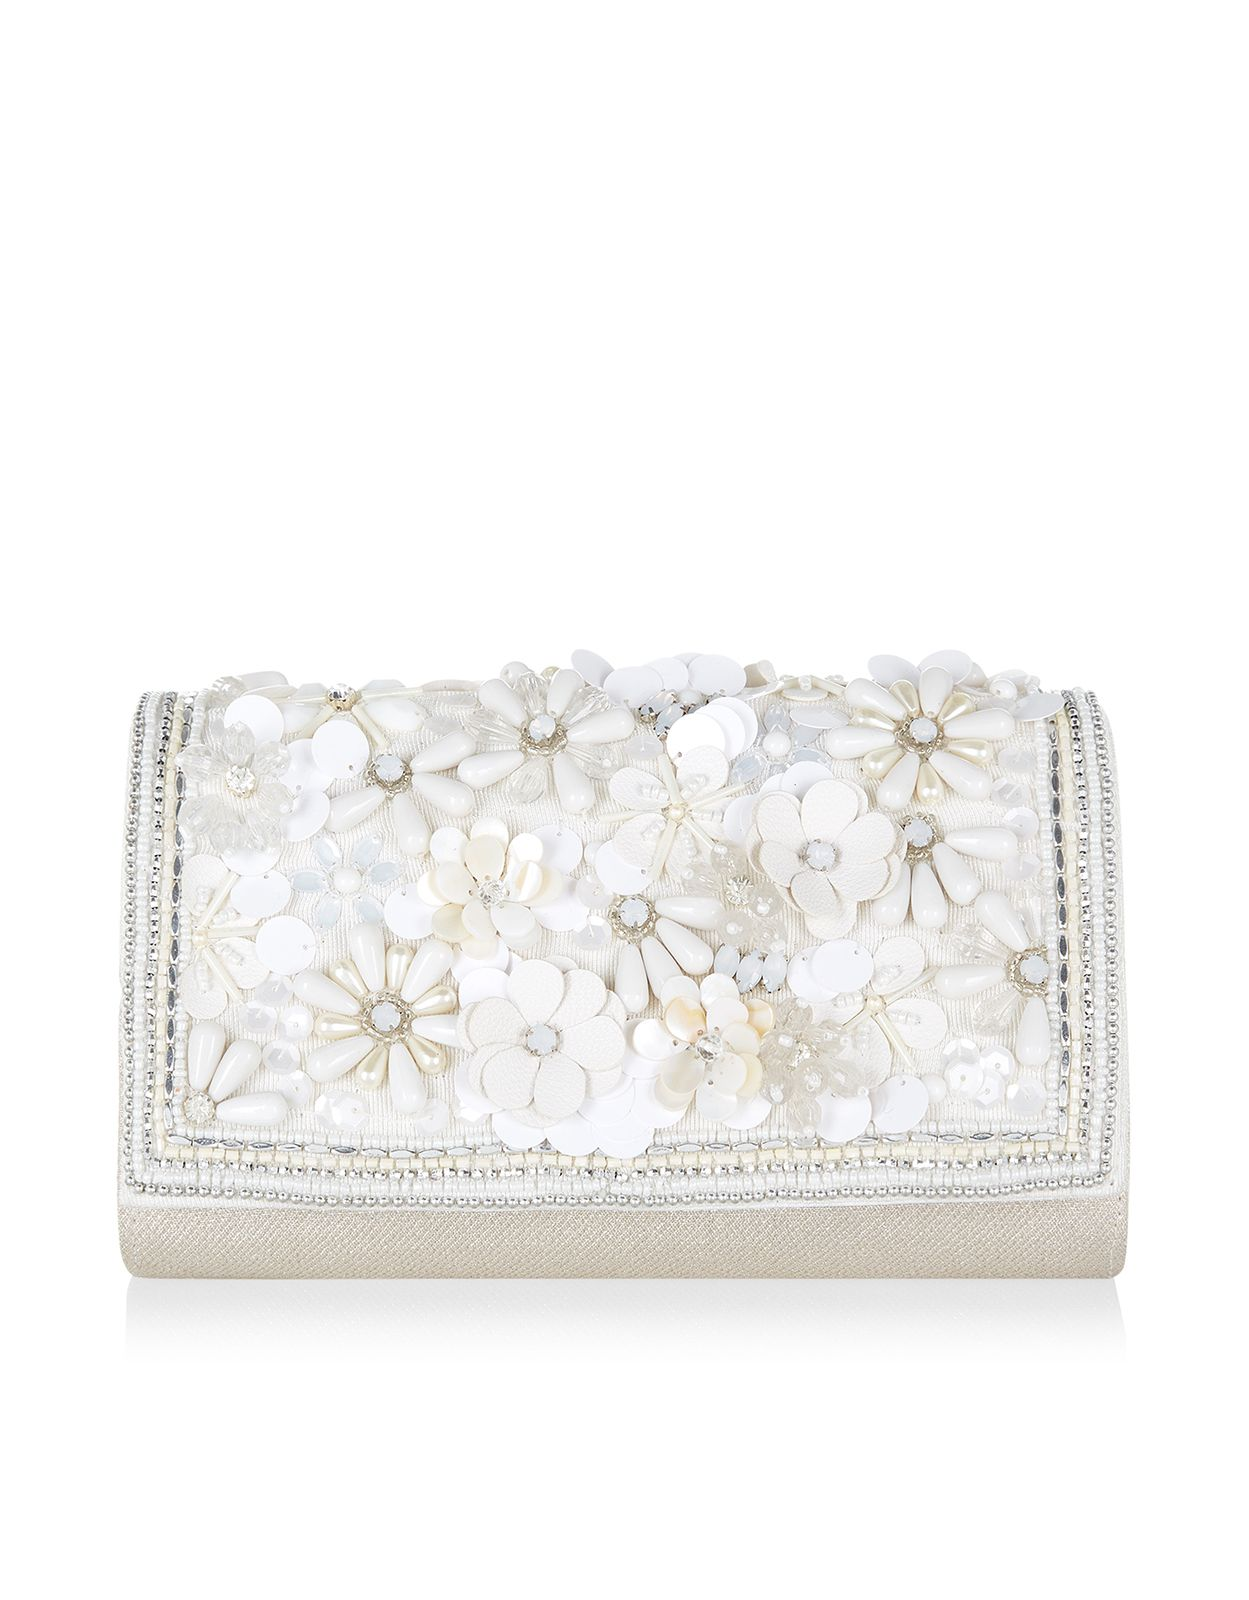 Belle Bridal Floral Flapover Clutch Bag   Ivory   Accessorize   Lust ...